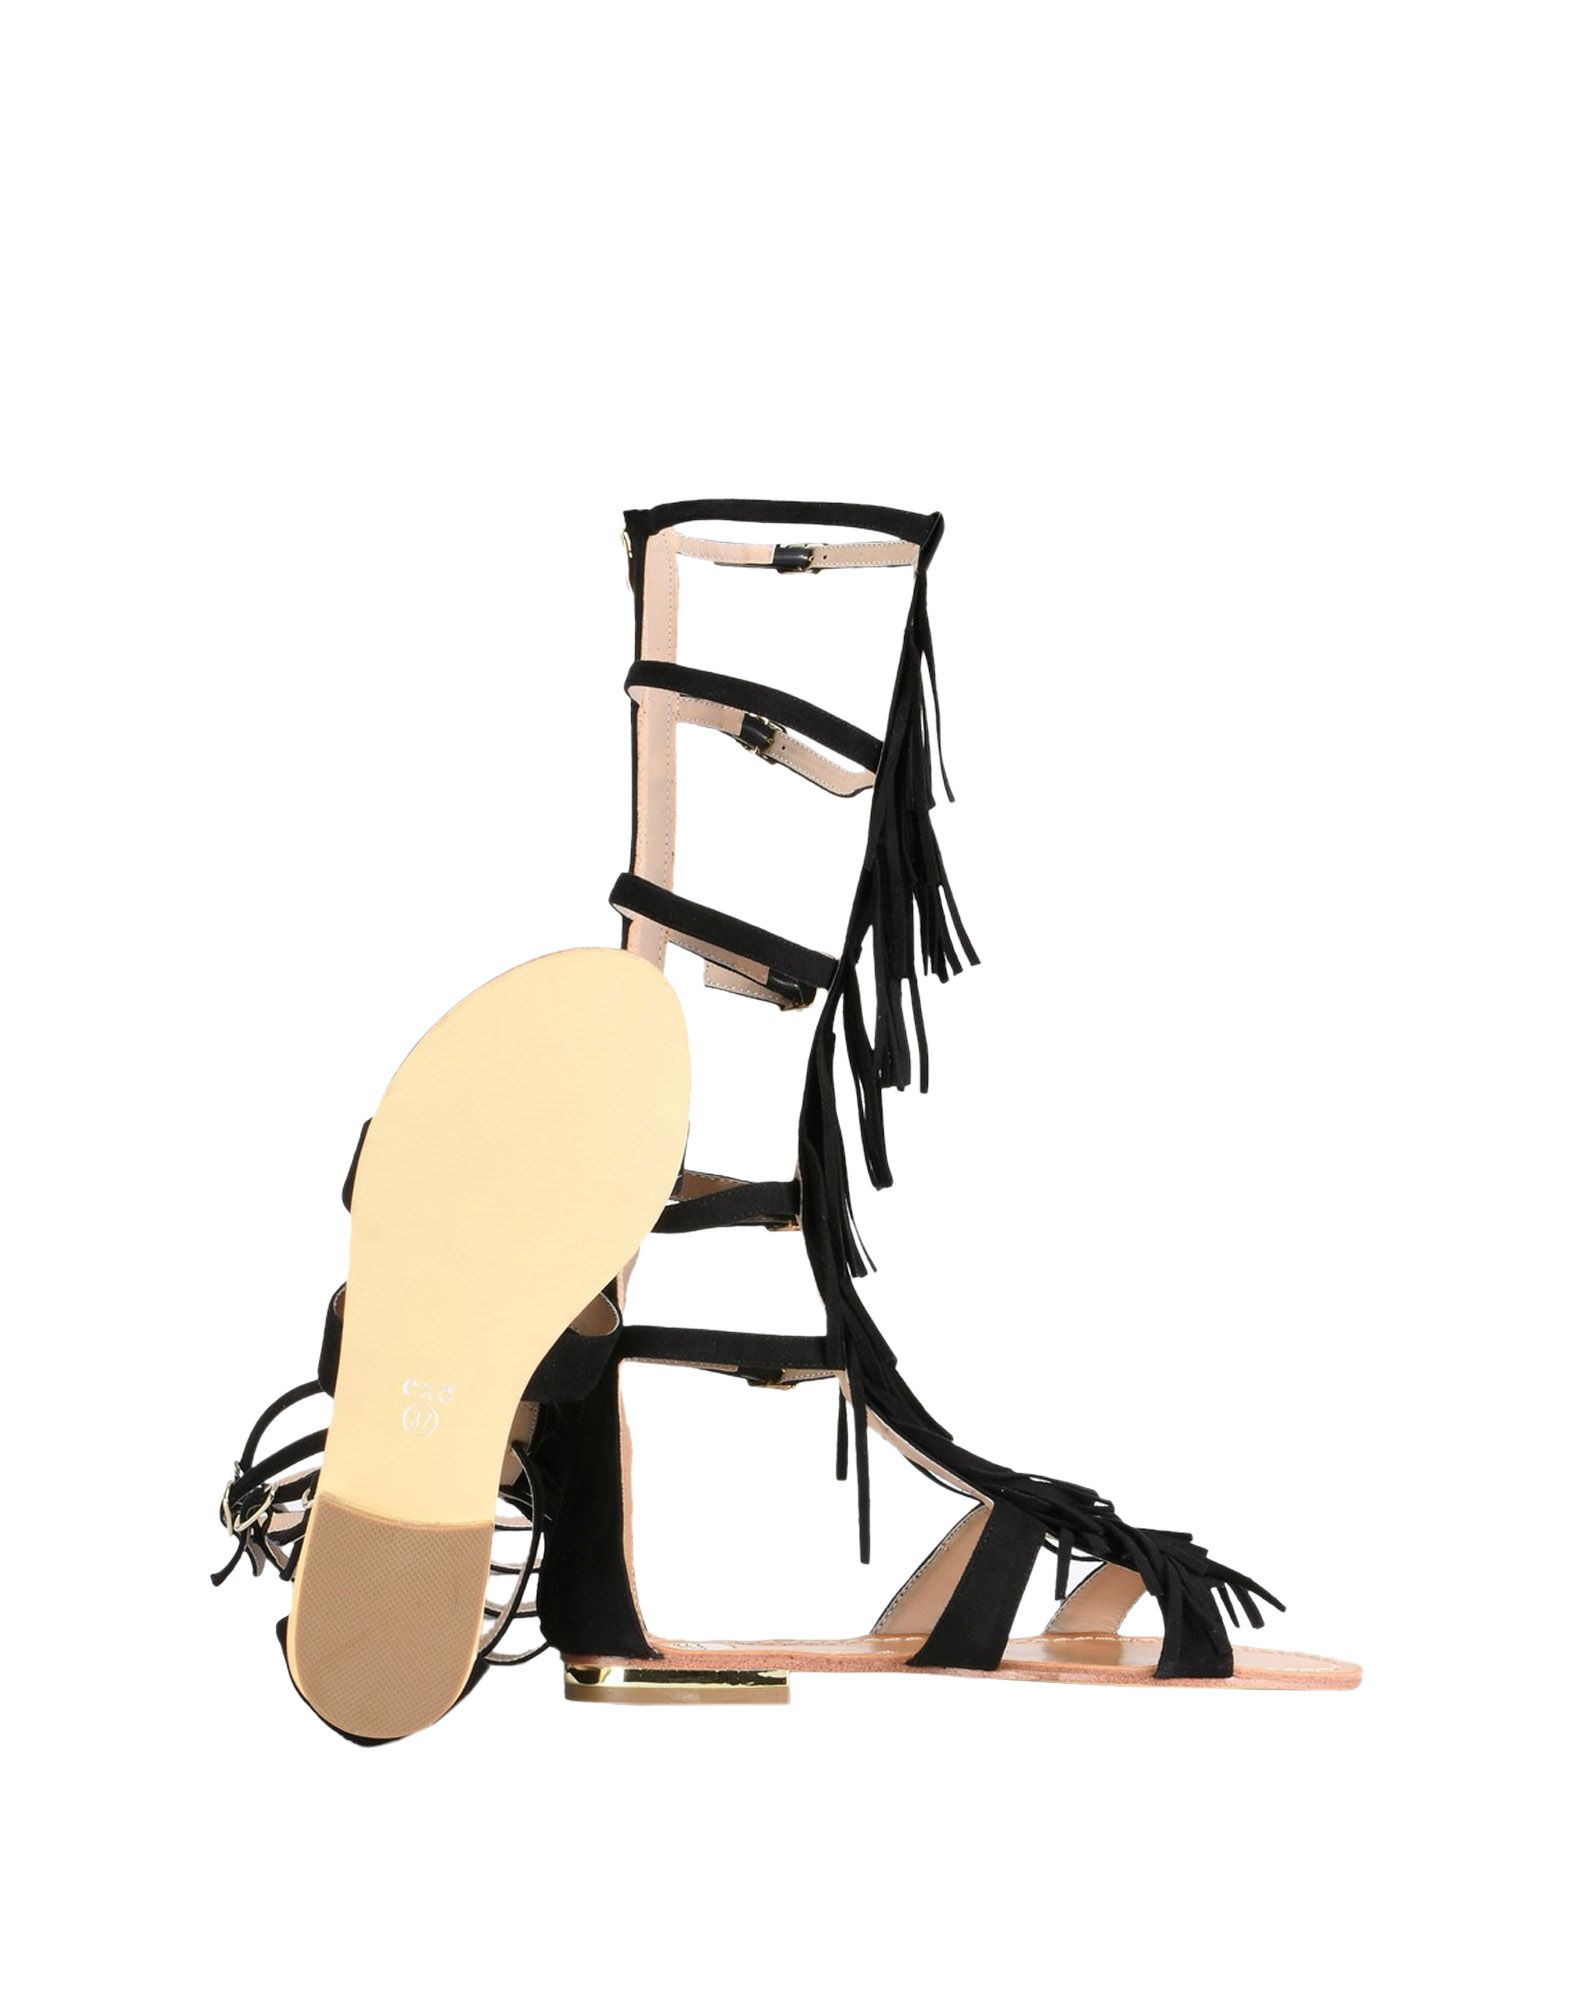 Sandales Exé By Tsakiris Mallas Femme - Sandales Exé By Tsakiris Mallas sur